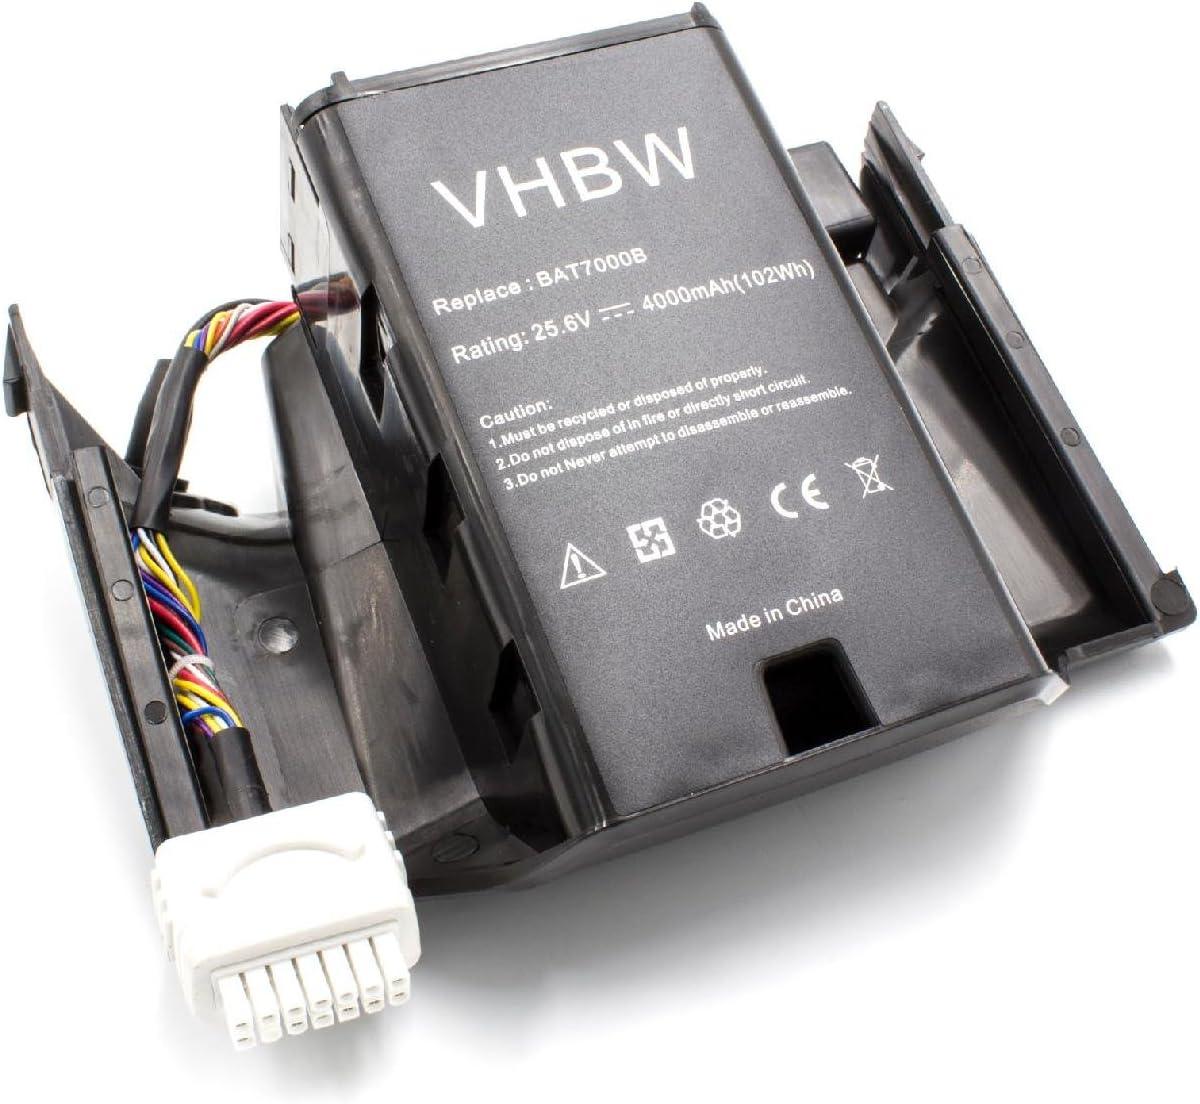 vhbw Li-Ion batería 4000mAh (25.6V) para cortacésped Robot cortacésped Wolf Garten R.S.400, R.S.600